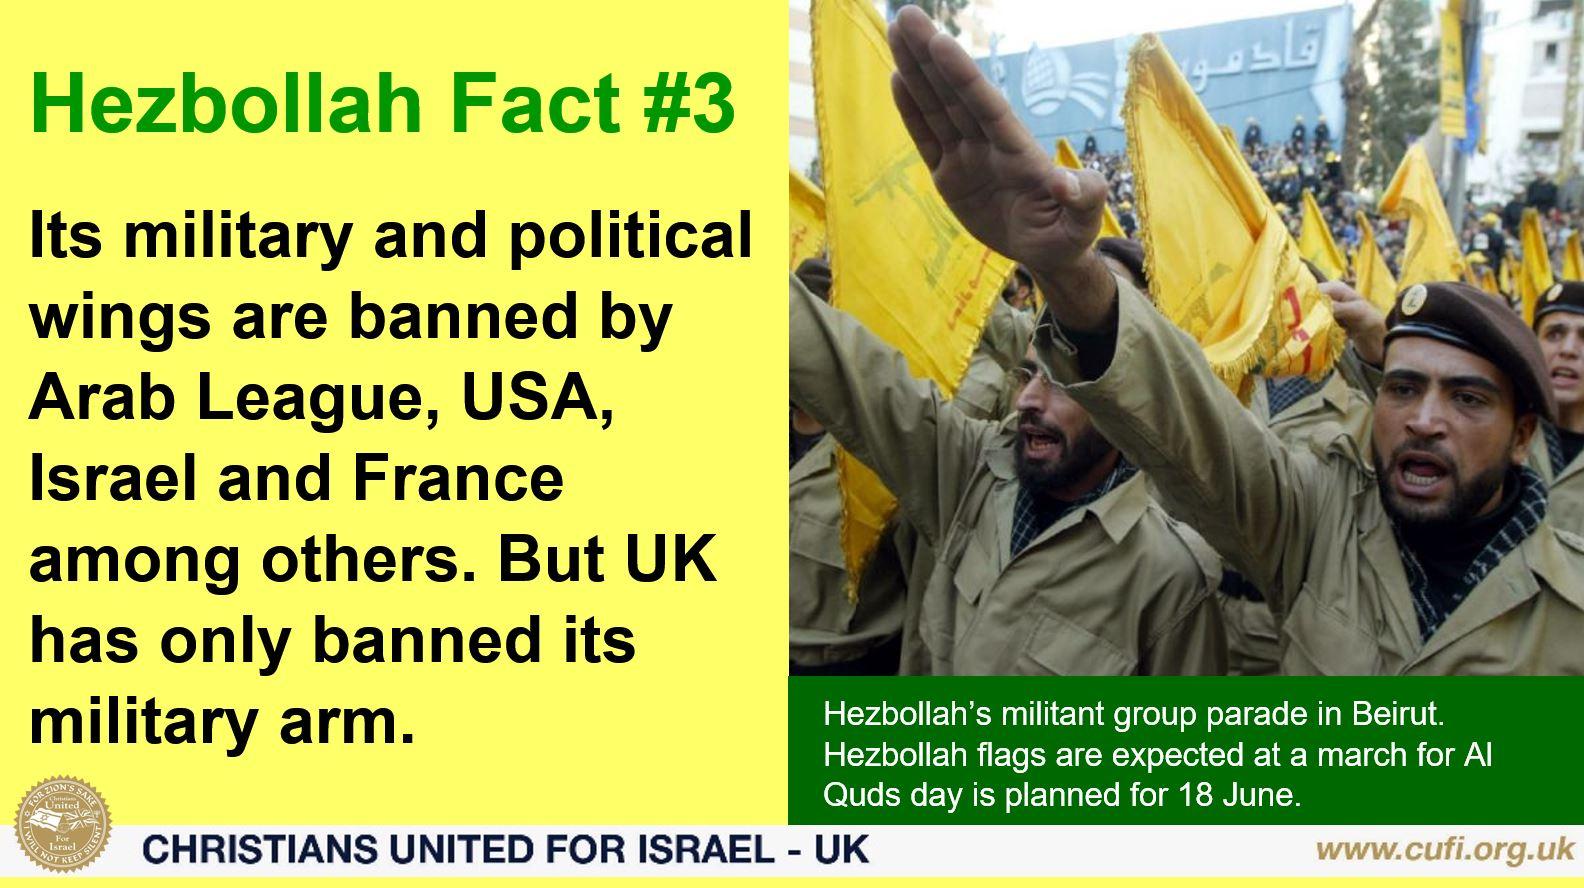 Hezbollah fac #3